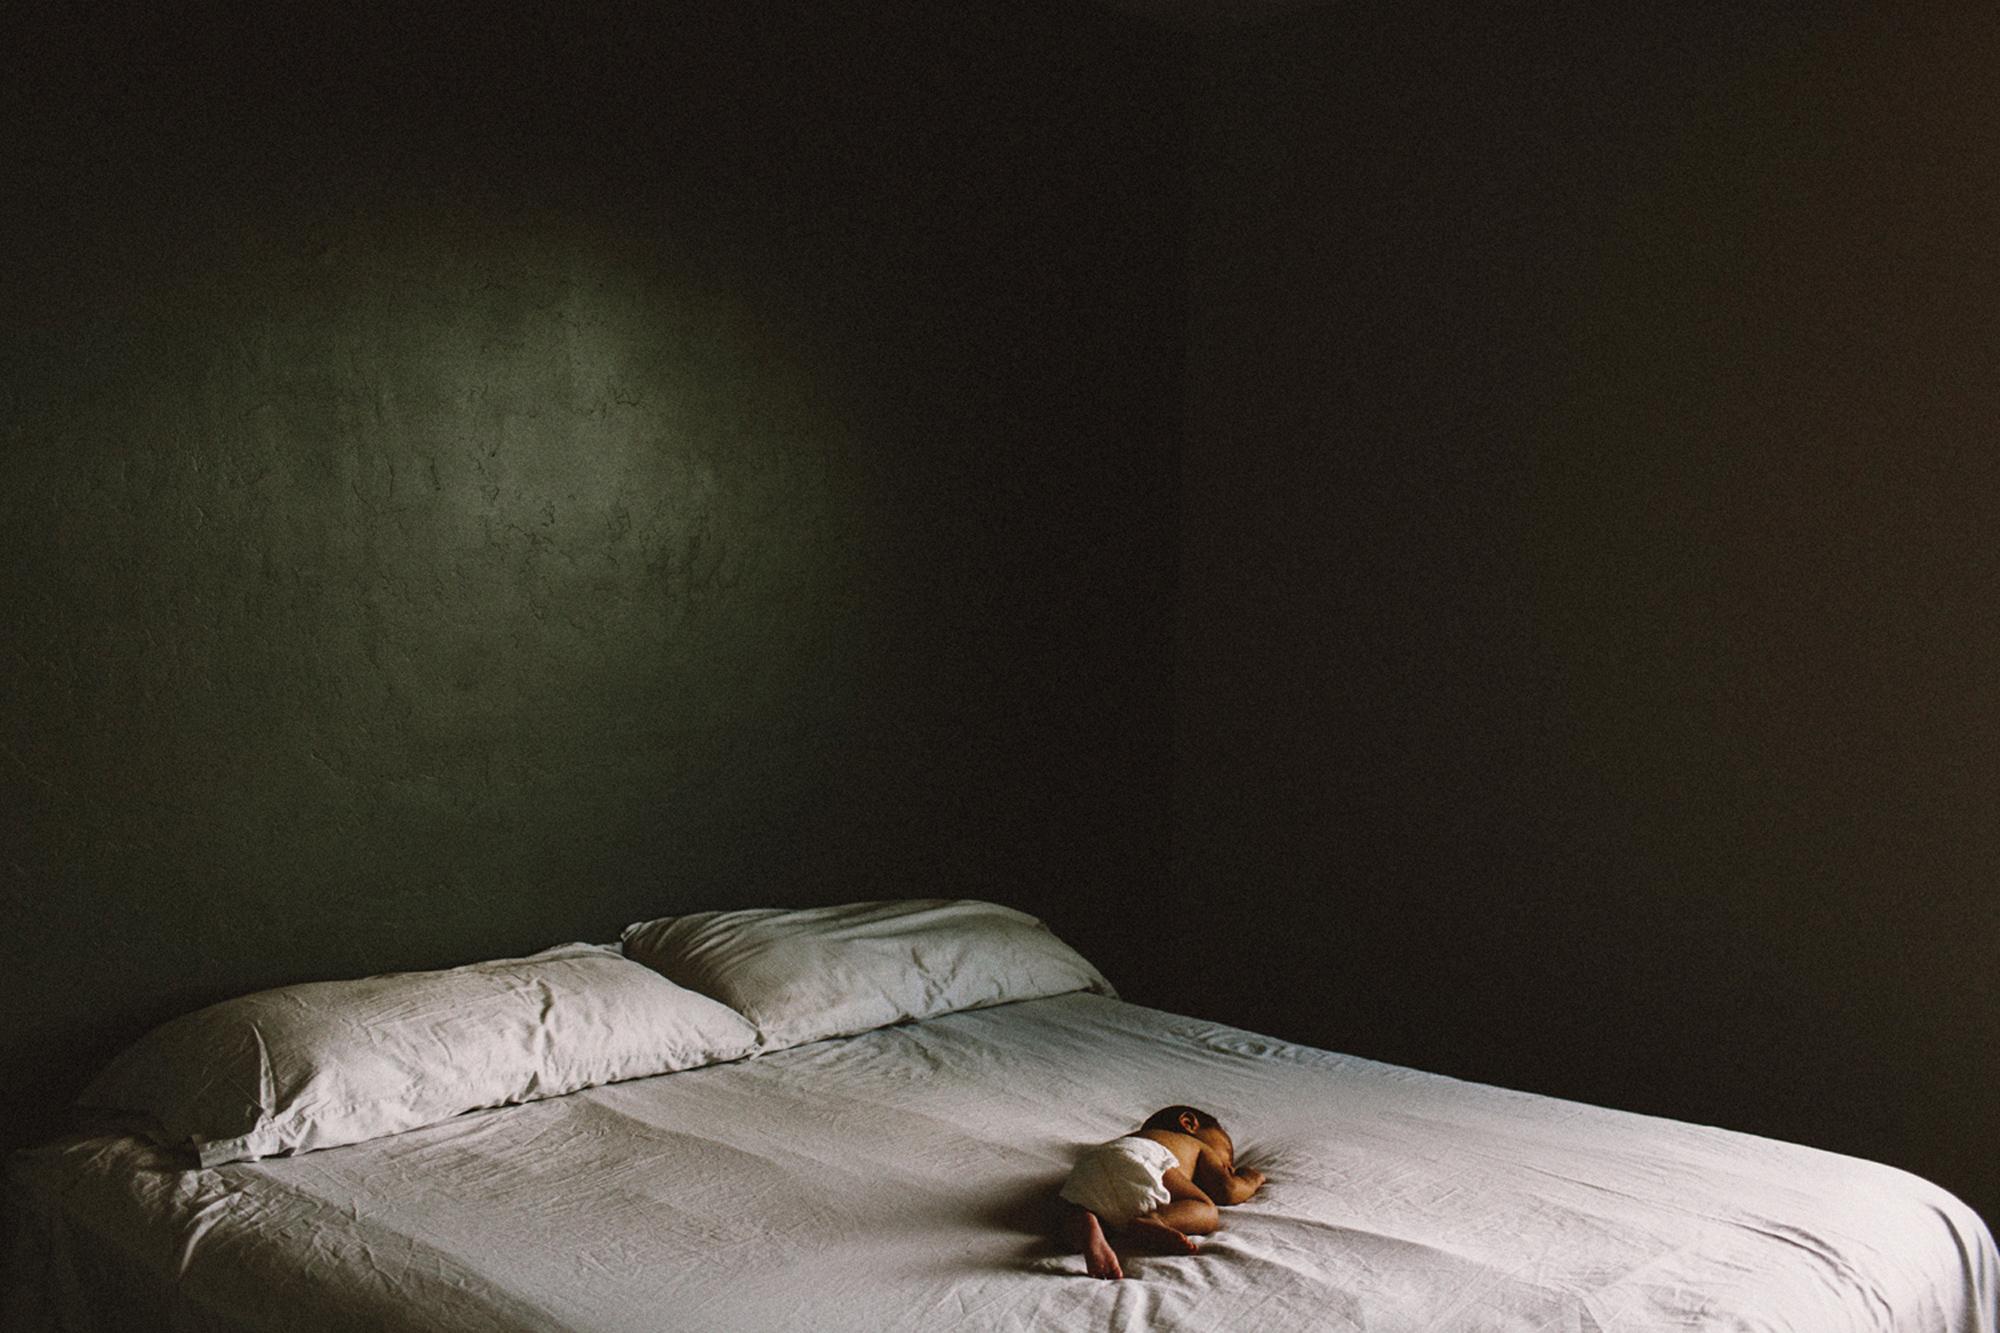 Newborn on bed